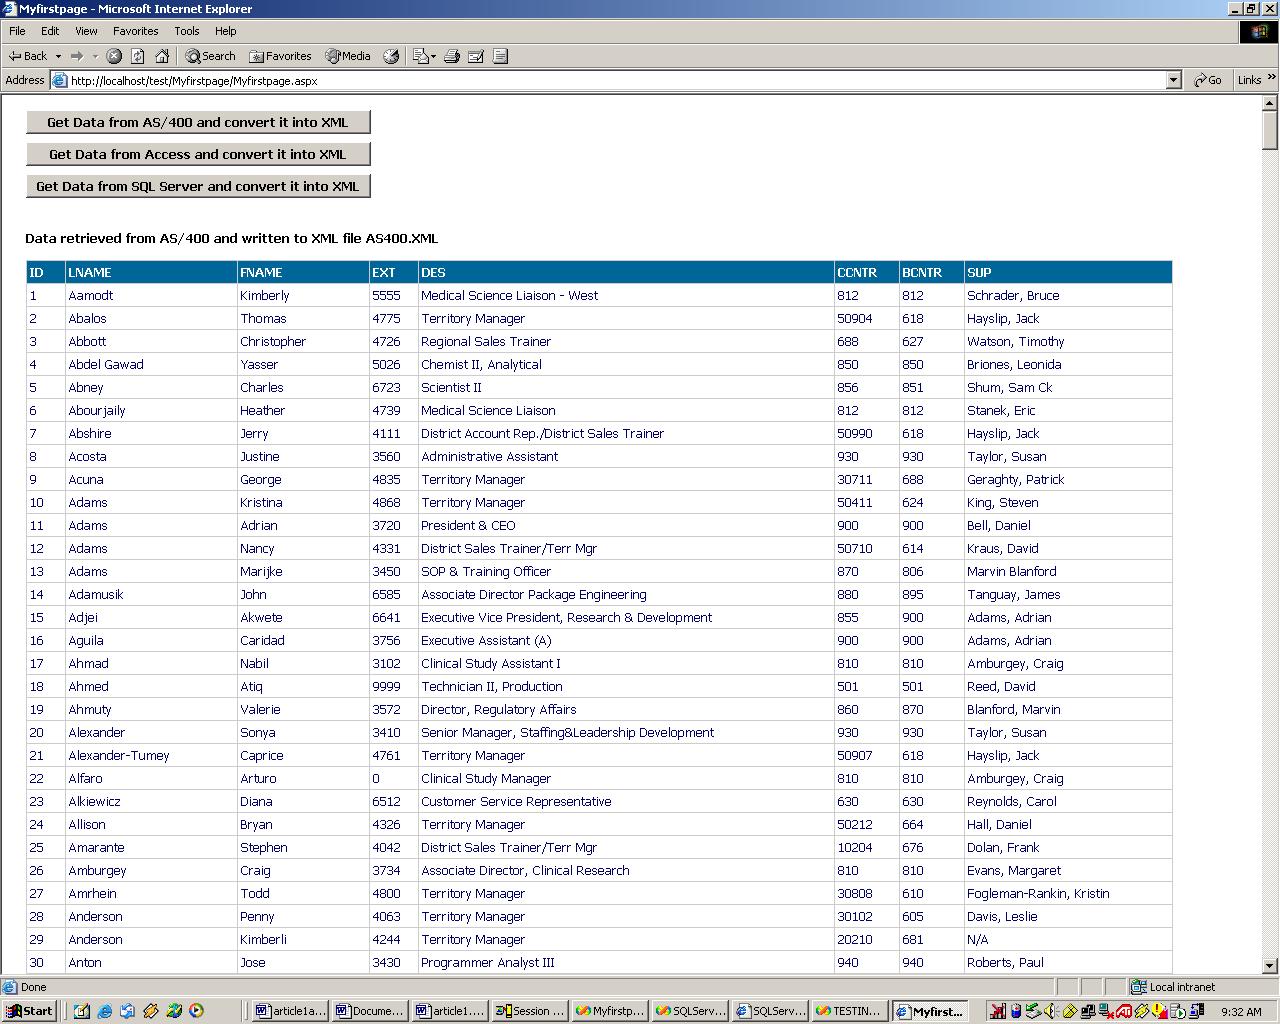 http://www.mcpressonline.com/articles/images/2002/article_final--Malik062104--ConvertToXML%20V407.png